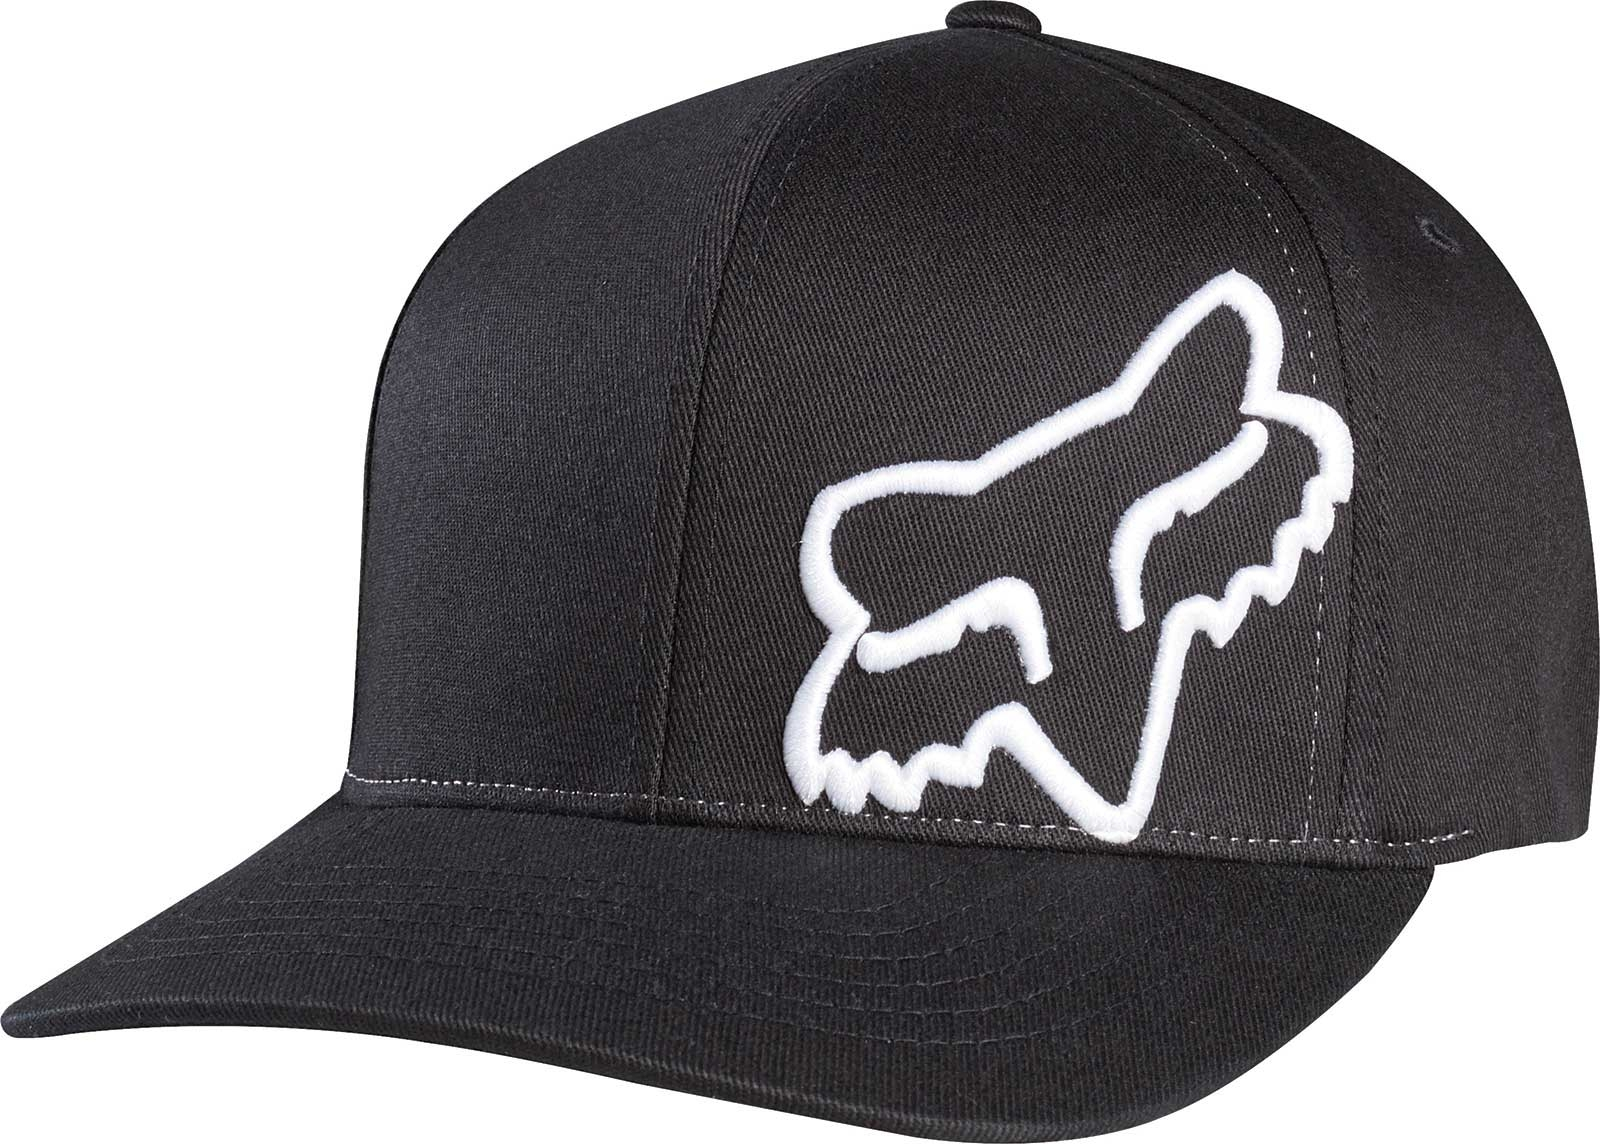 2bb3168632f Fox Men S Flex 45 Flexfit Hat Black White M